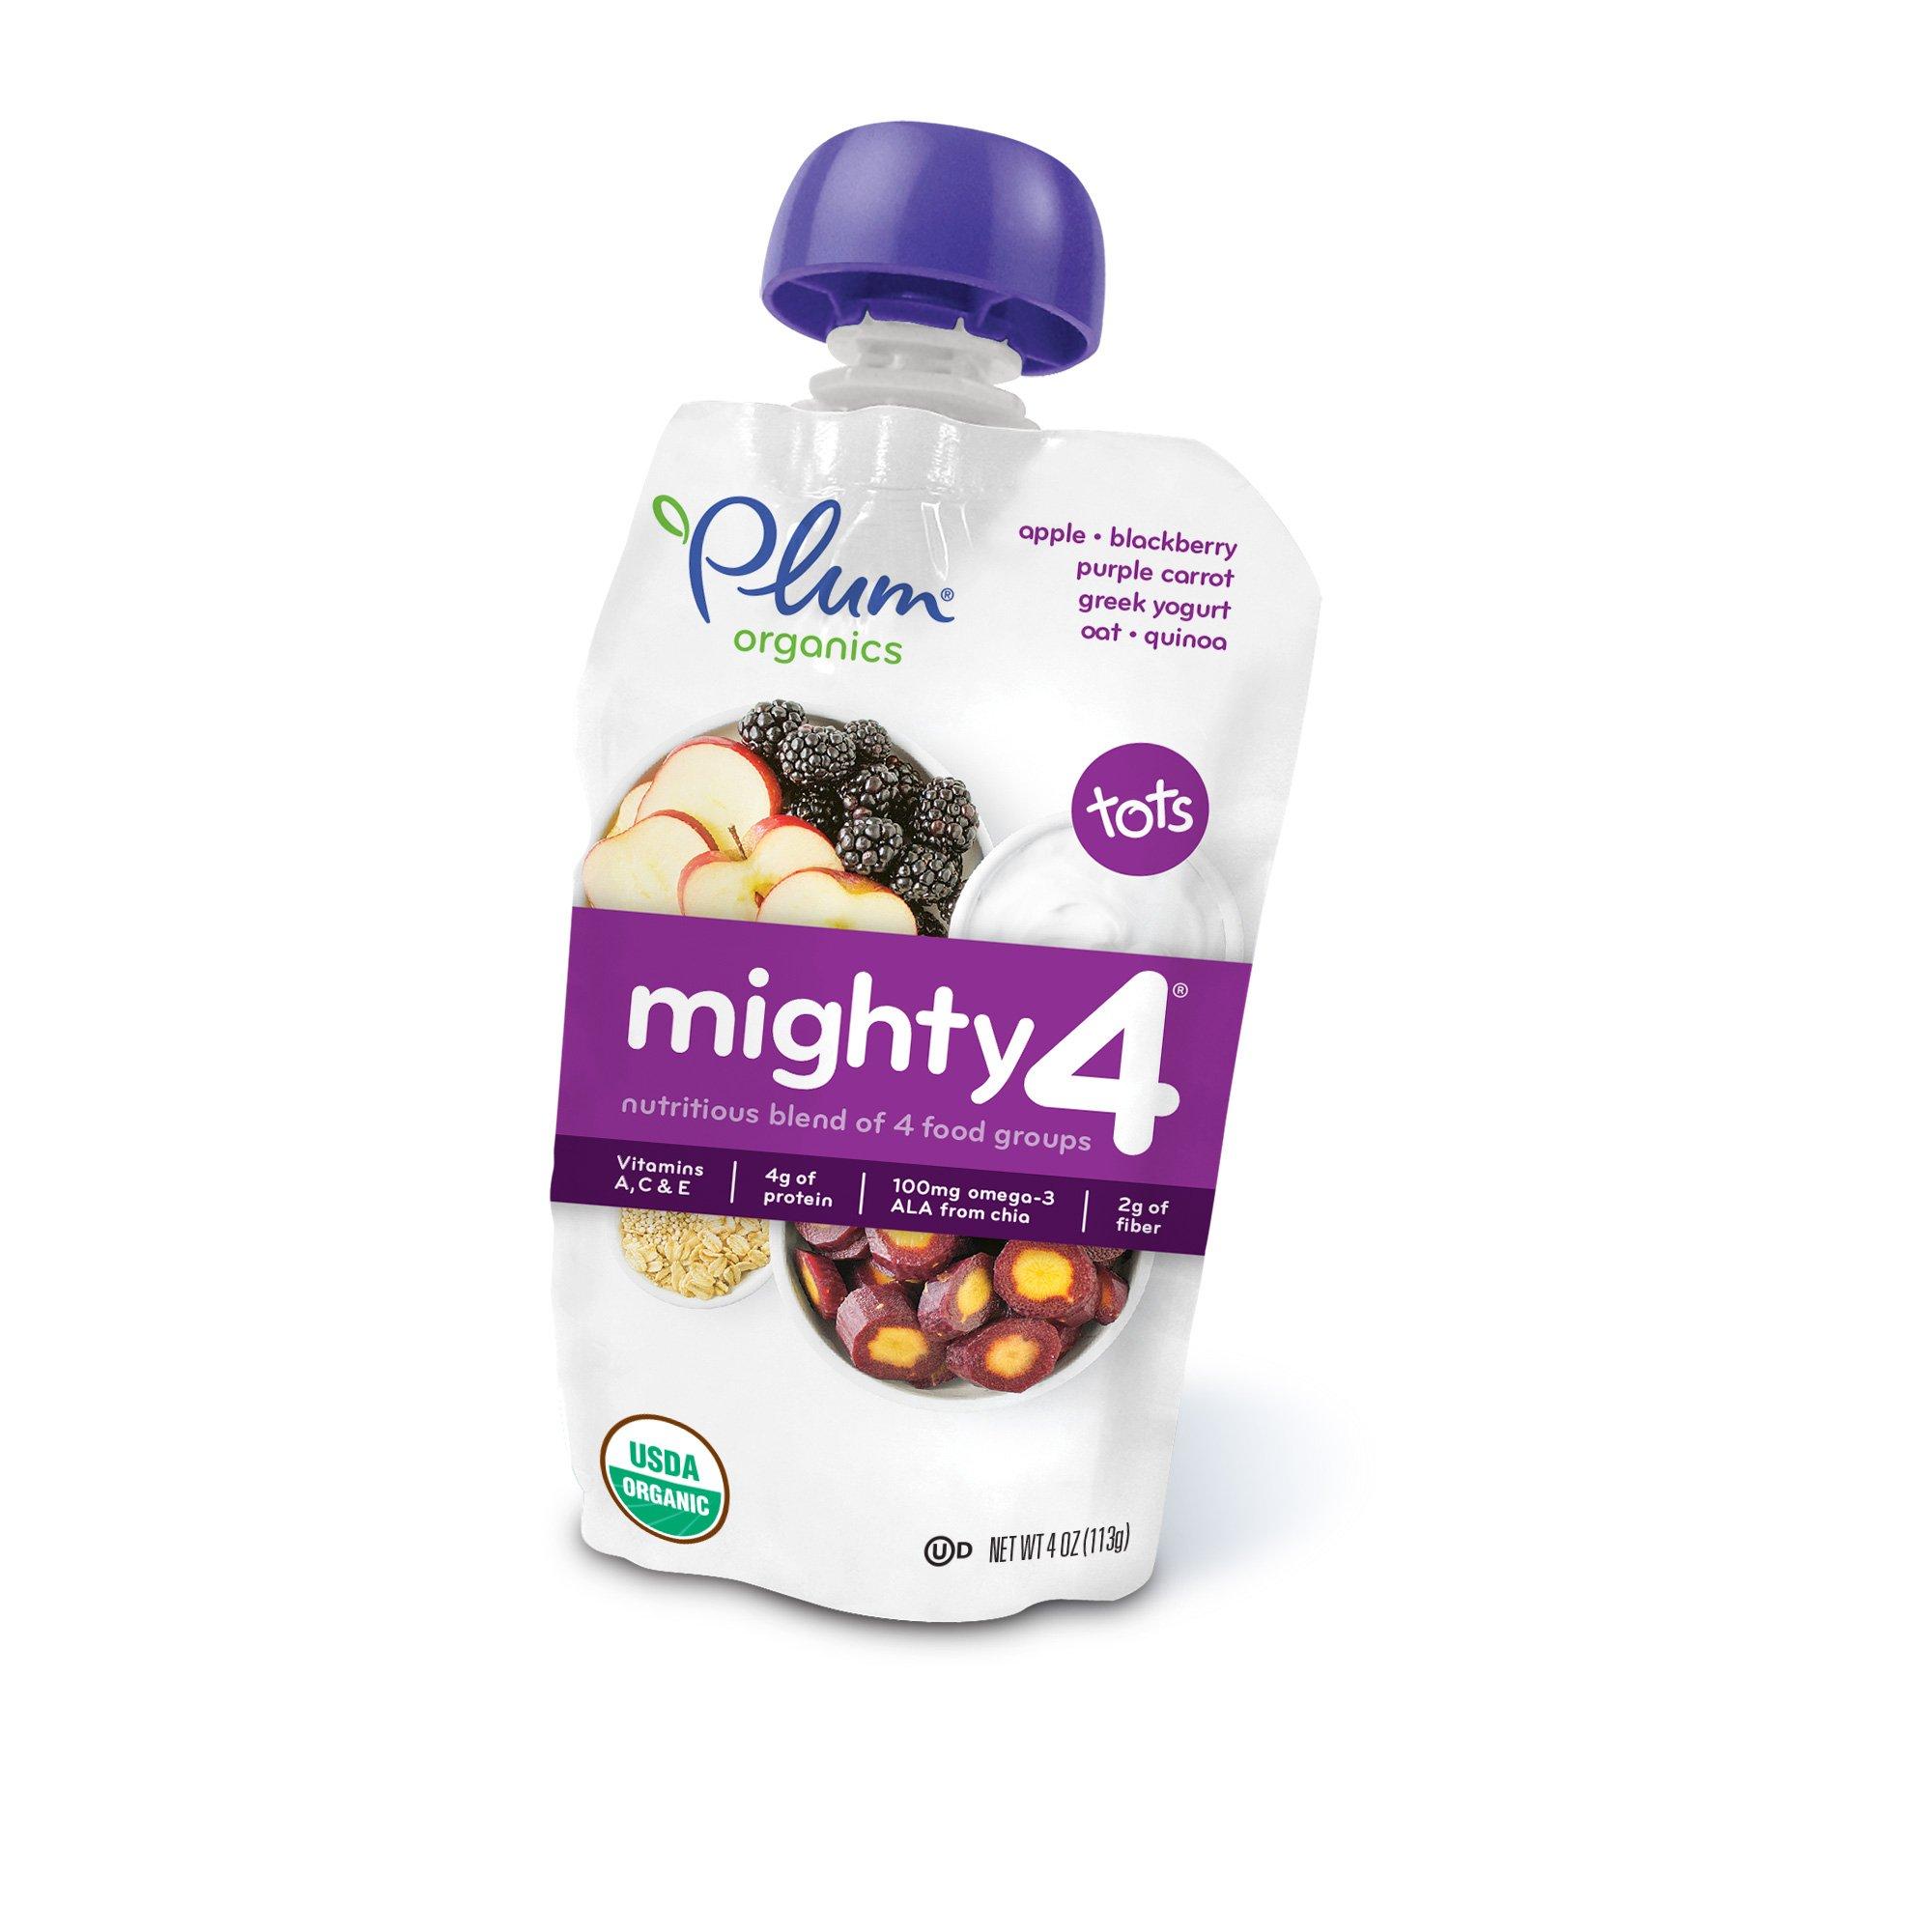 Plum Organics Mighty 4, Organic Toddler Food, Apple, Blackberry, Purple Carrot, Greek Yogurt, Oat and Quinoa,4 Ounce Pouch (Pack of 12)